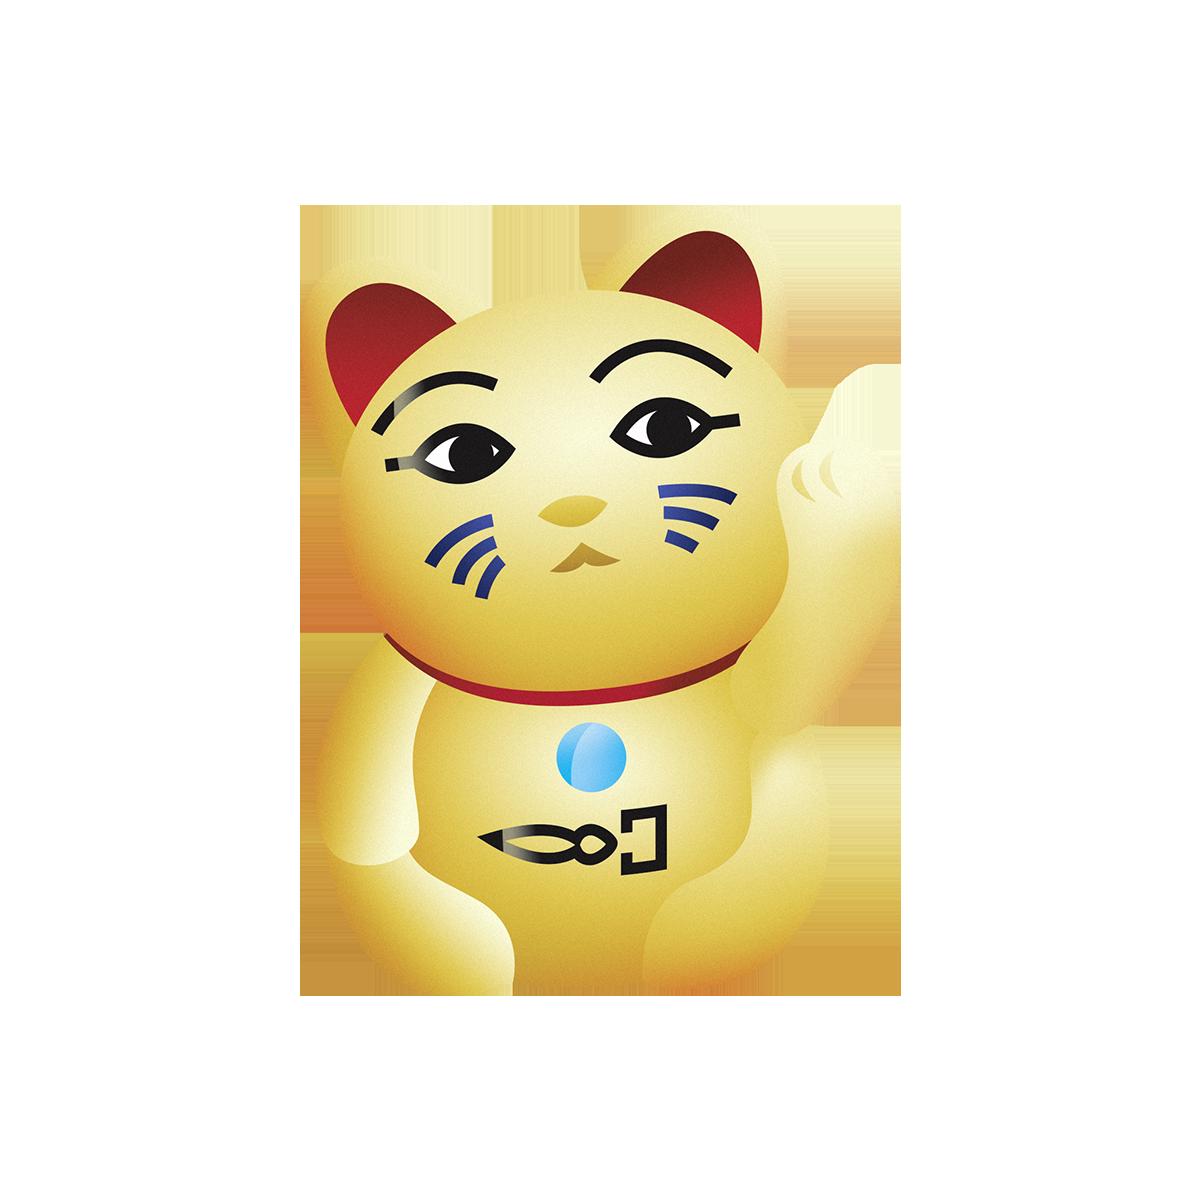 SEB_B-TBOE_eciRGB_04_Cat2